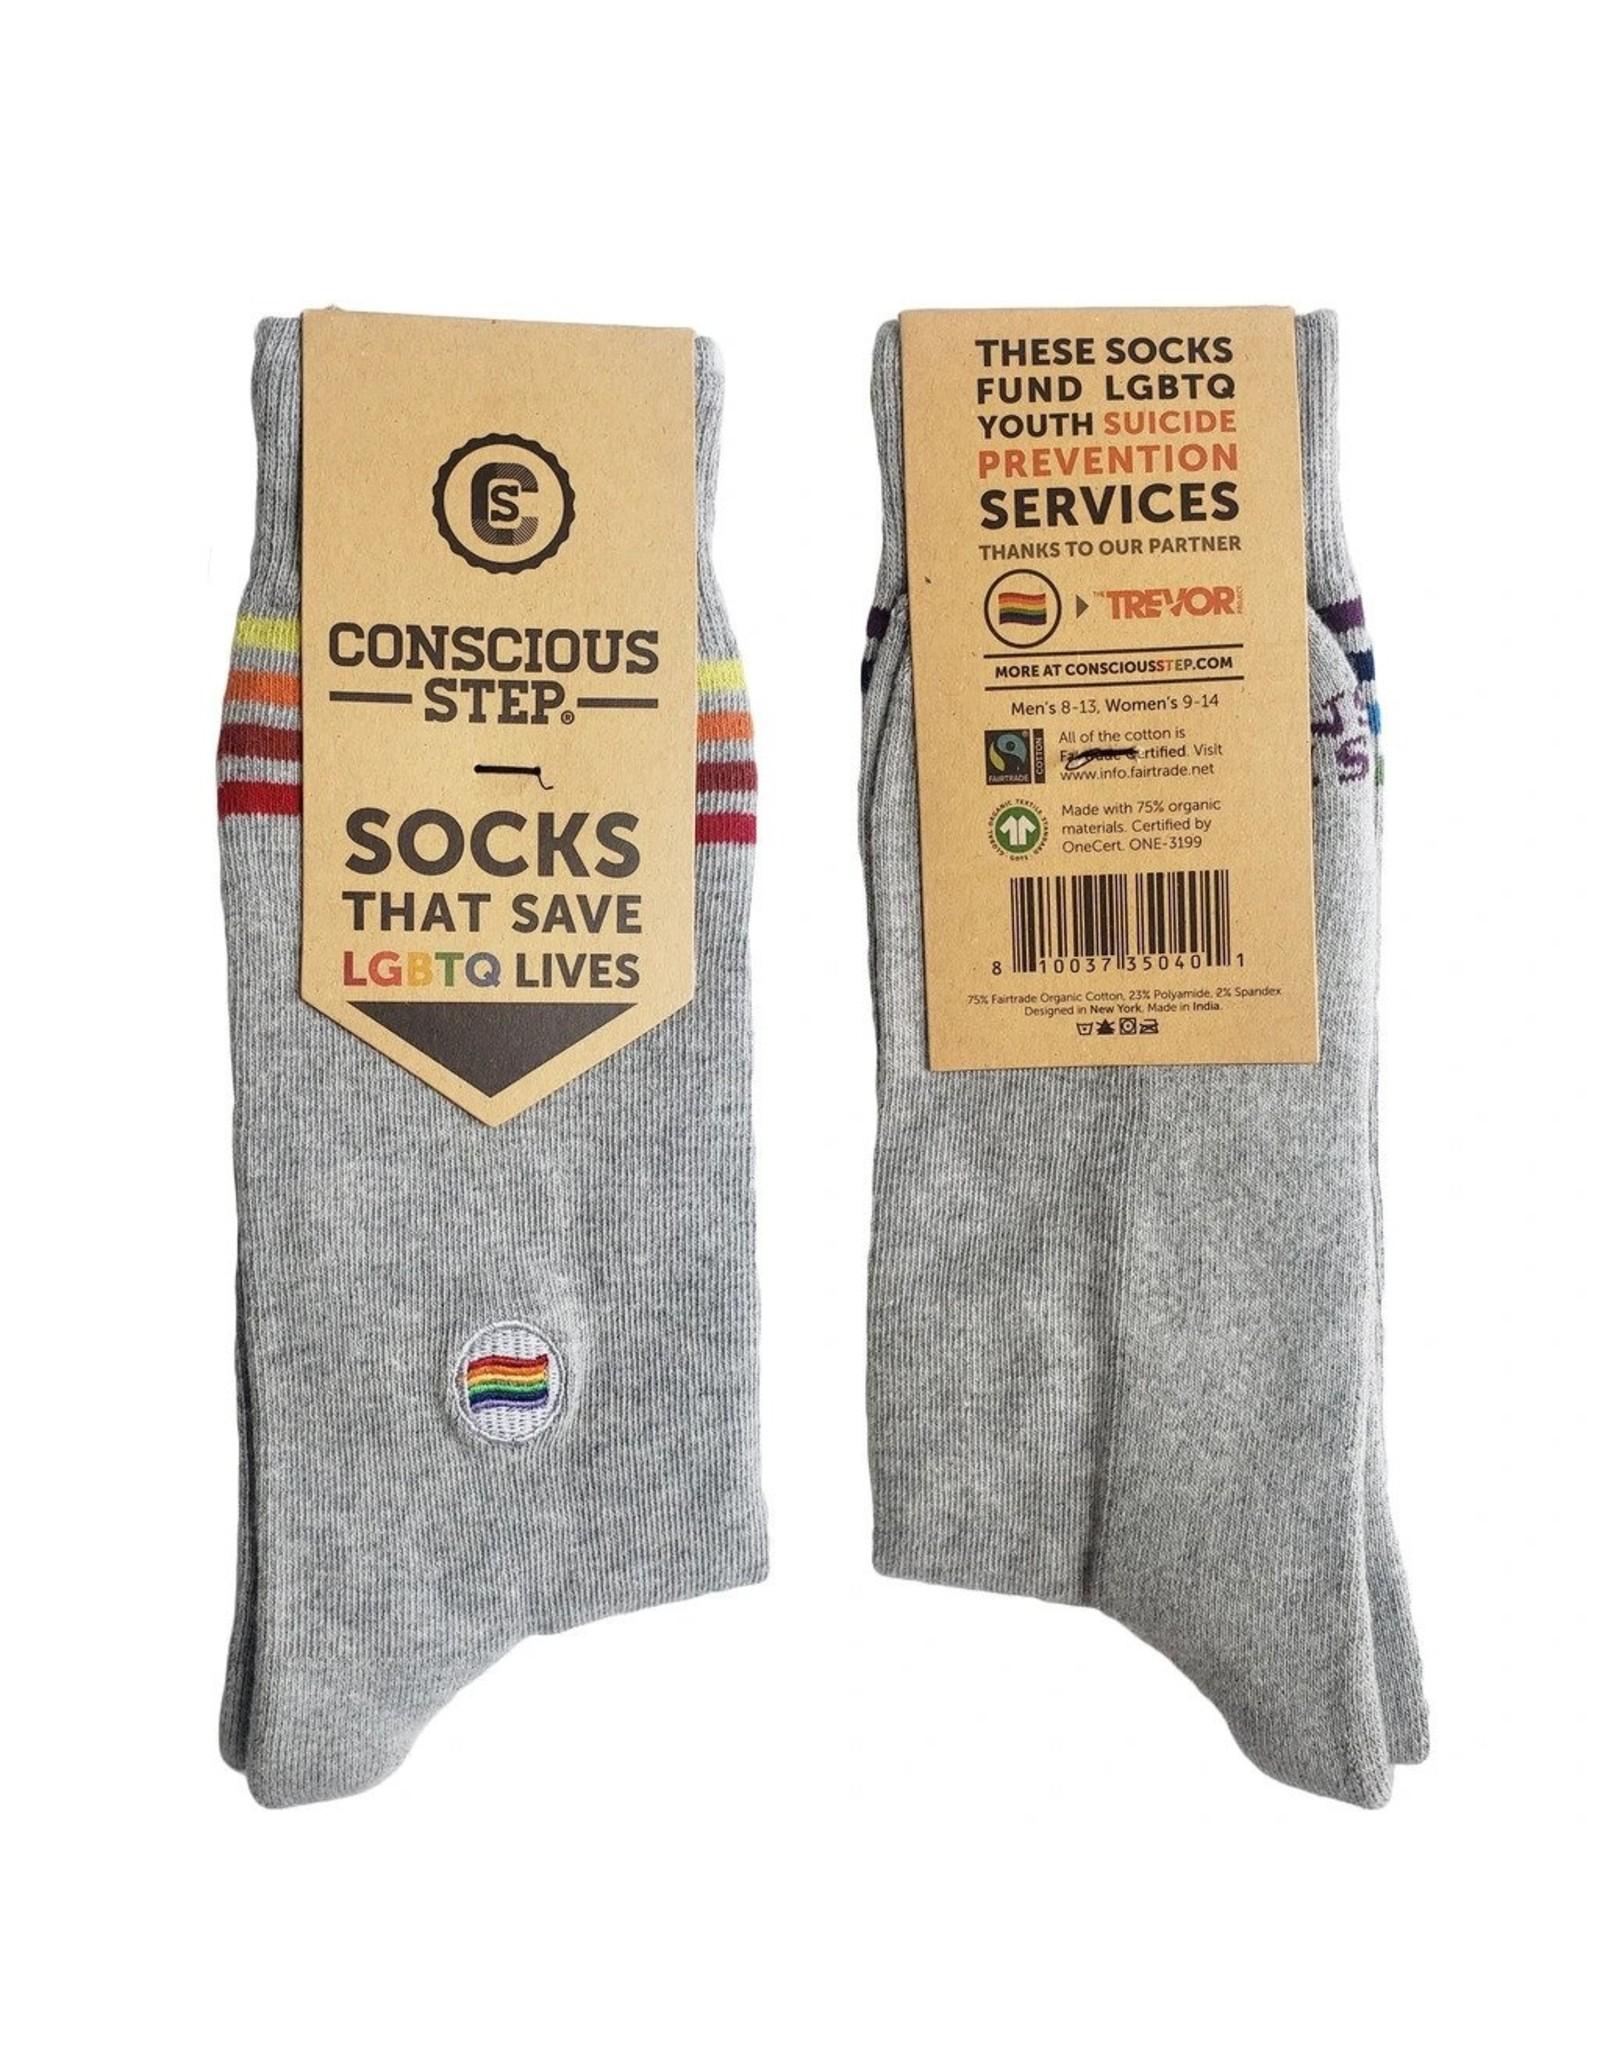 Socks that Save LGBTQ Lives